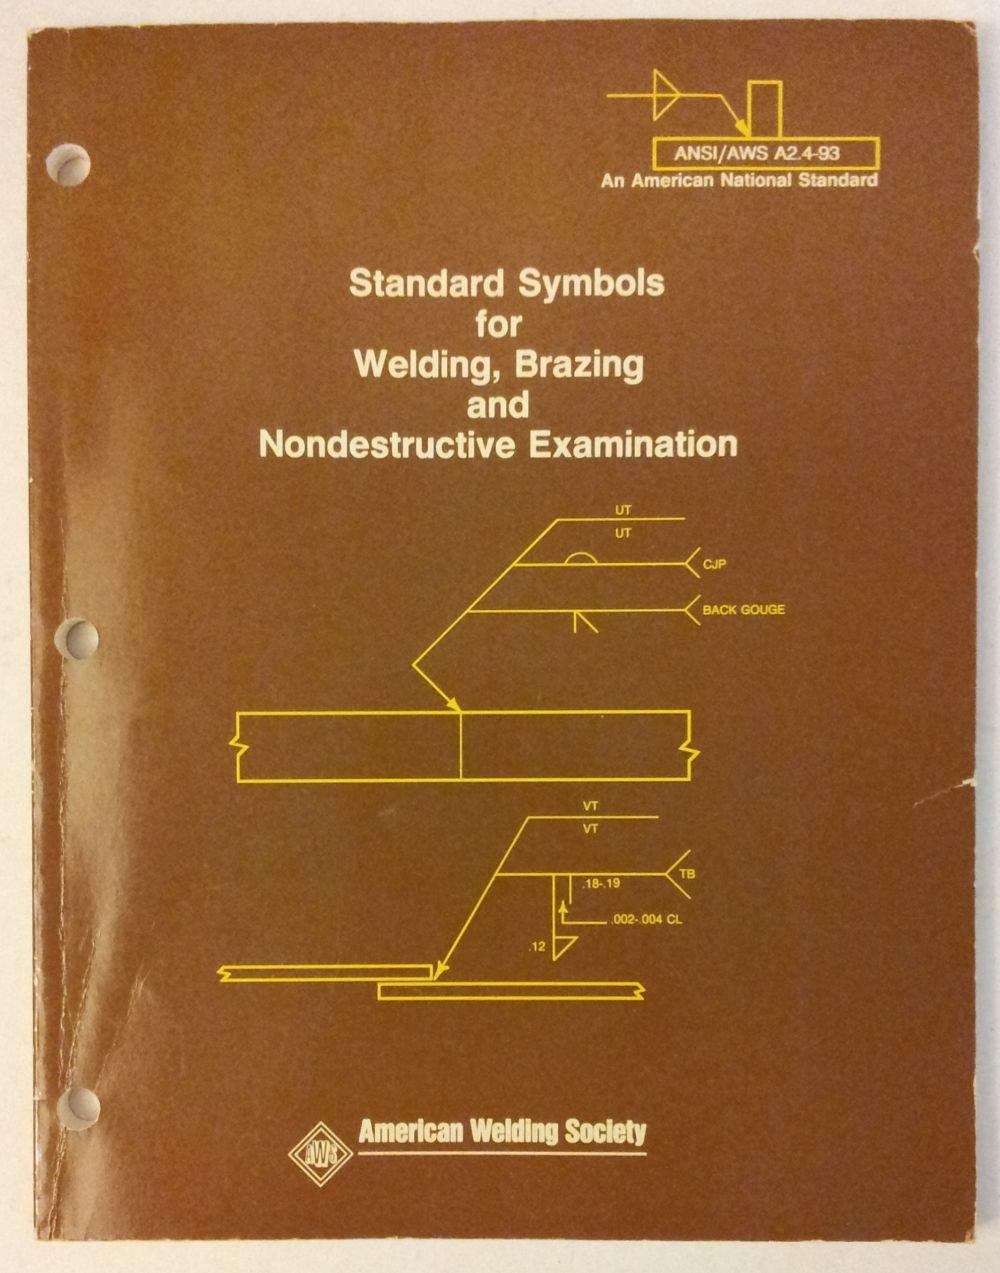 Standard symbols for welding brazing nondestructive examination standard symbols for welding brazing nondestructive examination a24 94 9780871713704 amazon books biocorpaavc Images